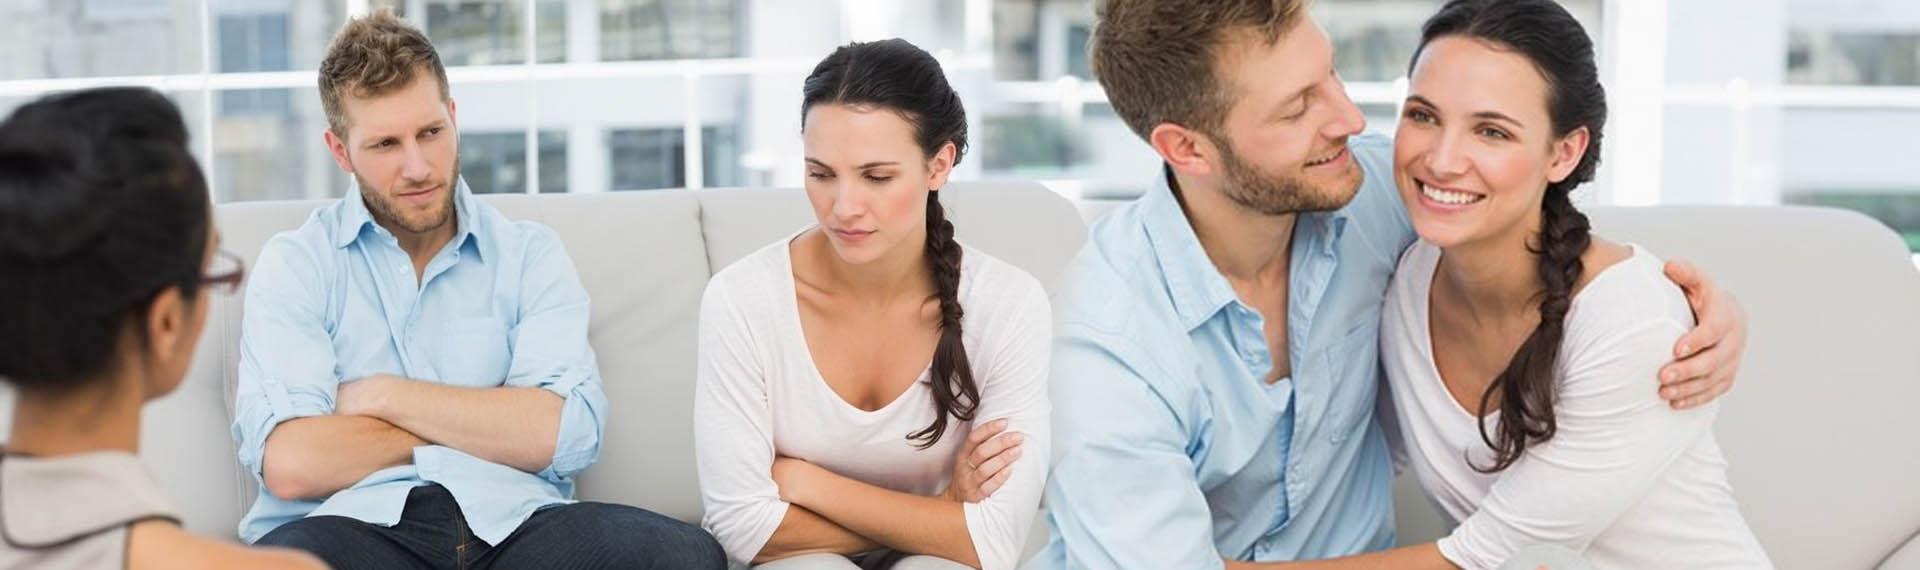 ana-belen-silguero-psicologo-terapia-pareja